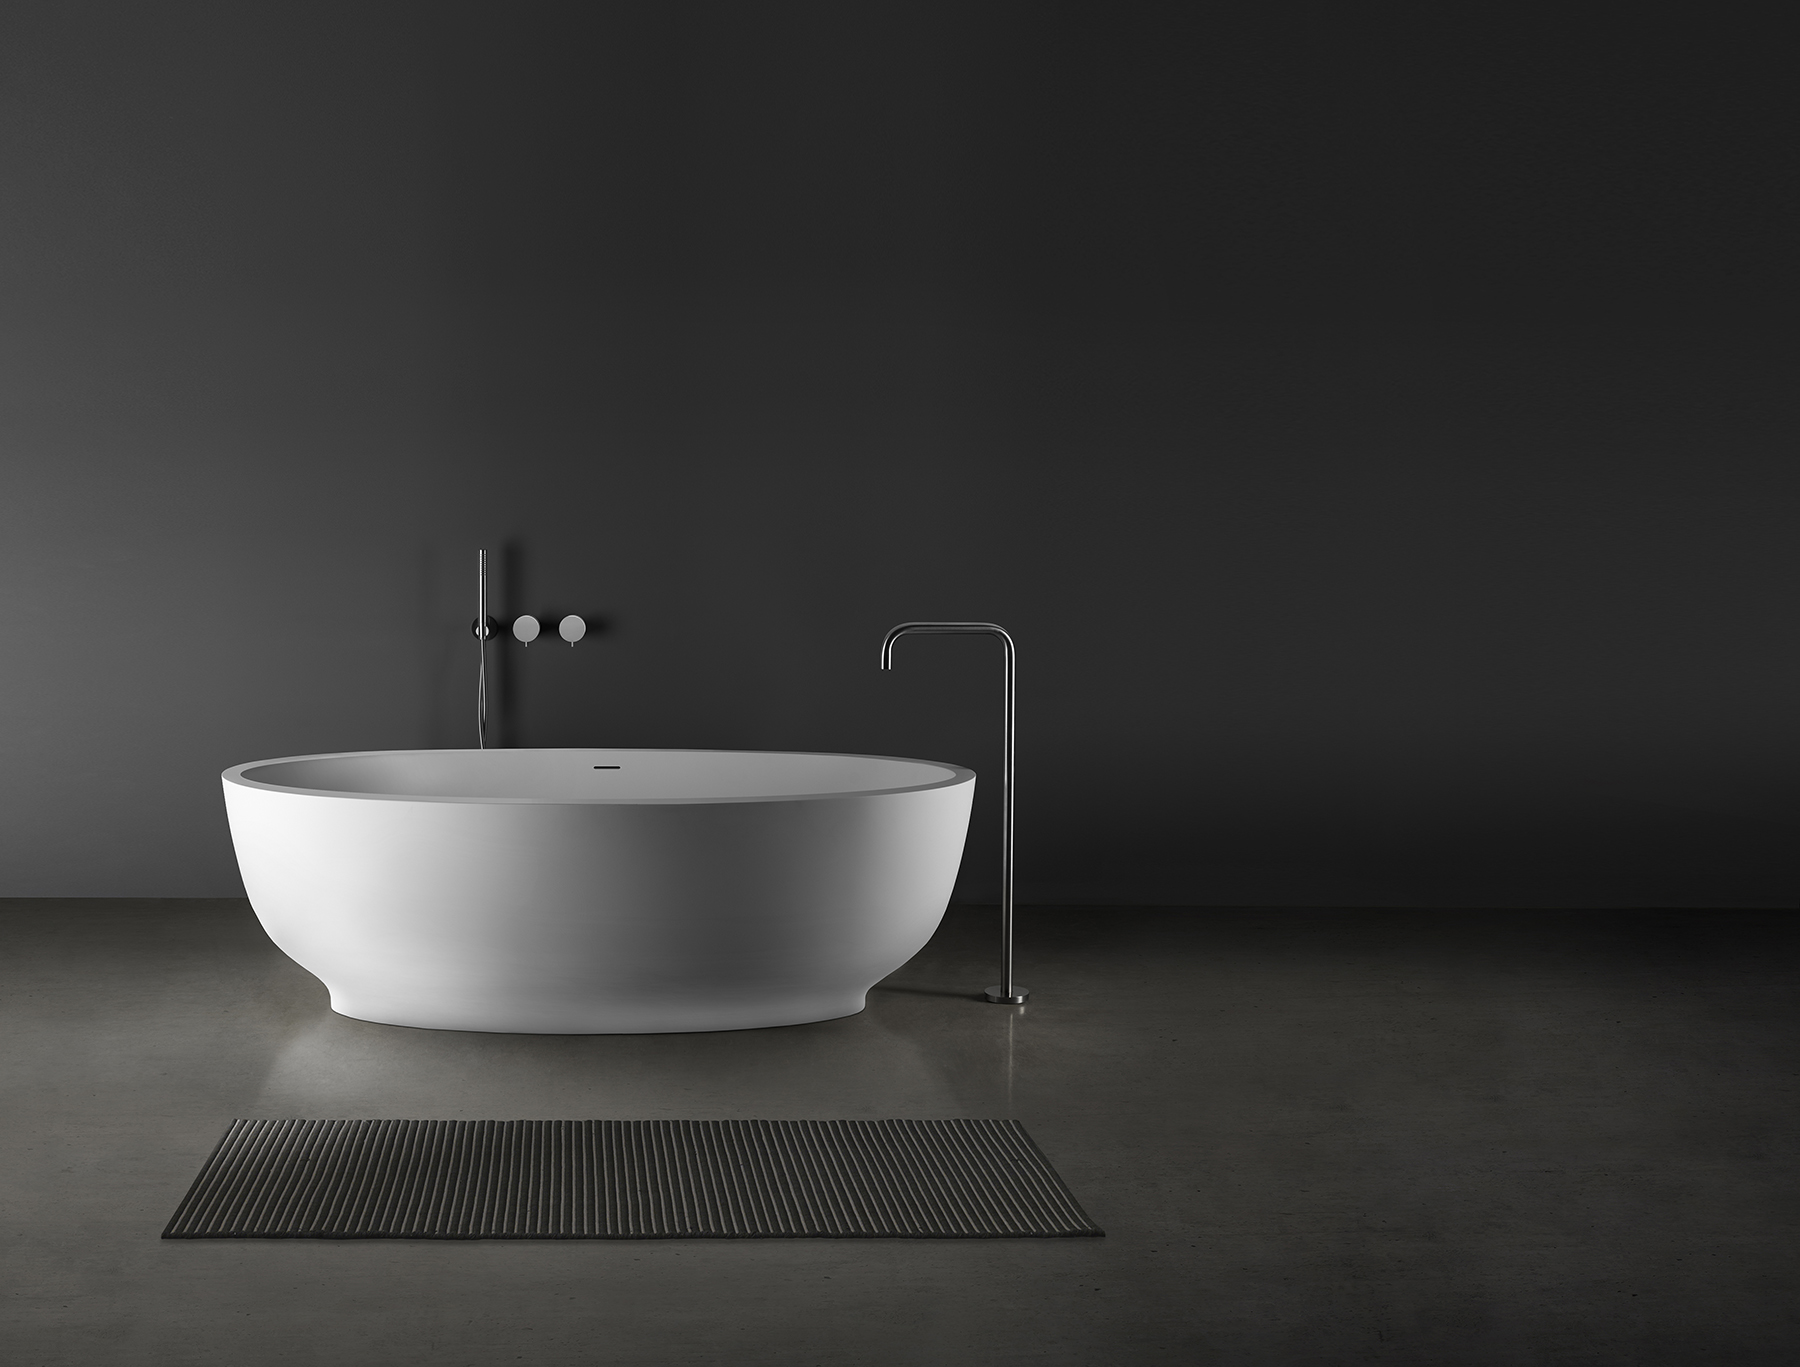 Modern Fini Freestanding Oval Bathtub